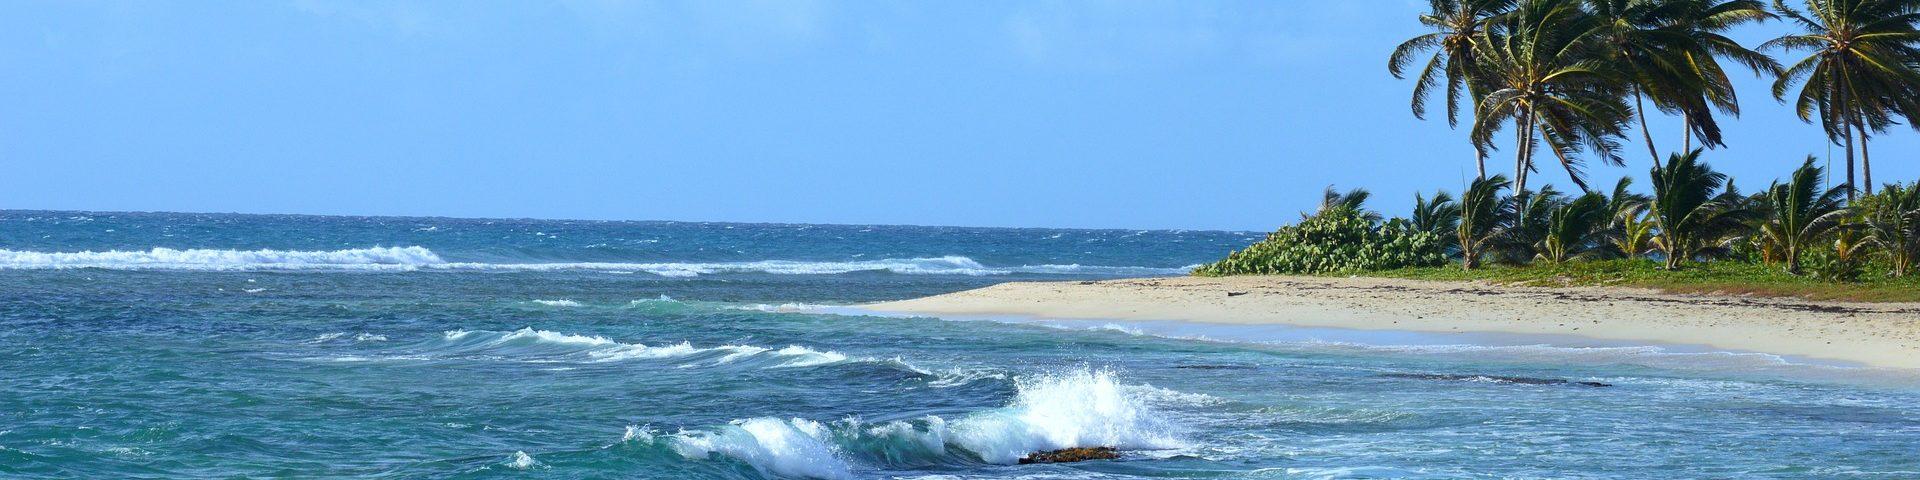 CoffeeMeetsBeach - Best Beaches in Guadeloupe